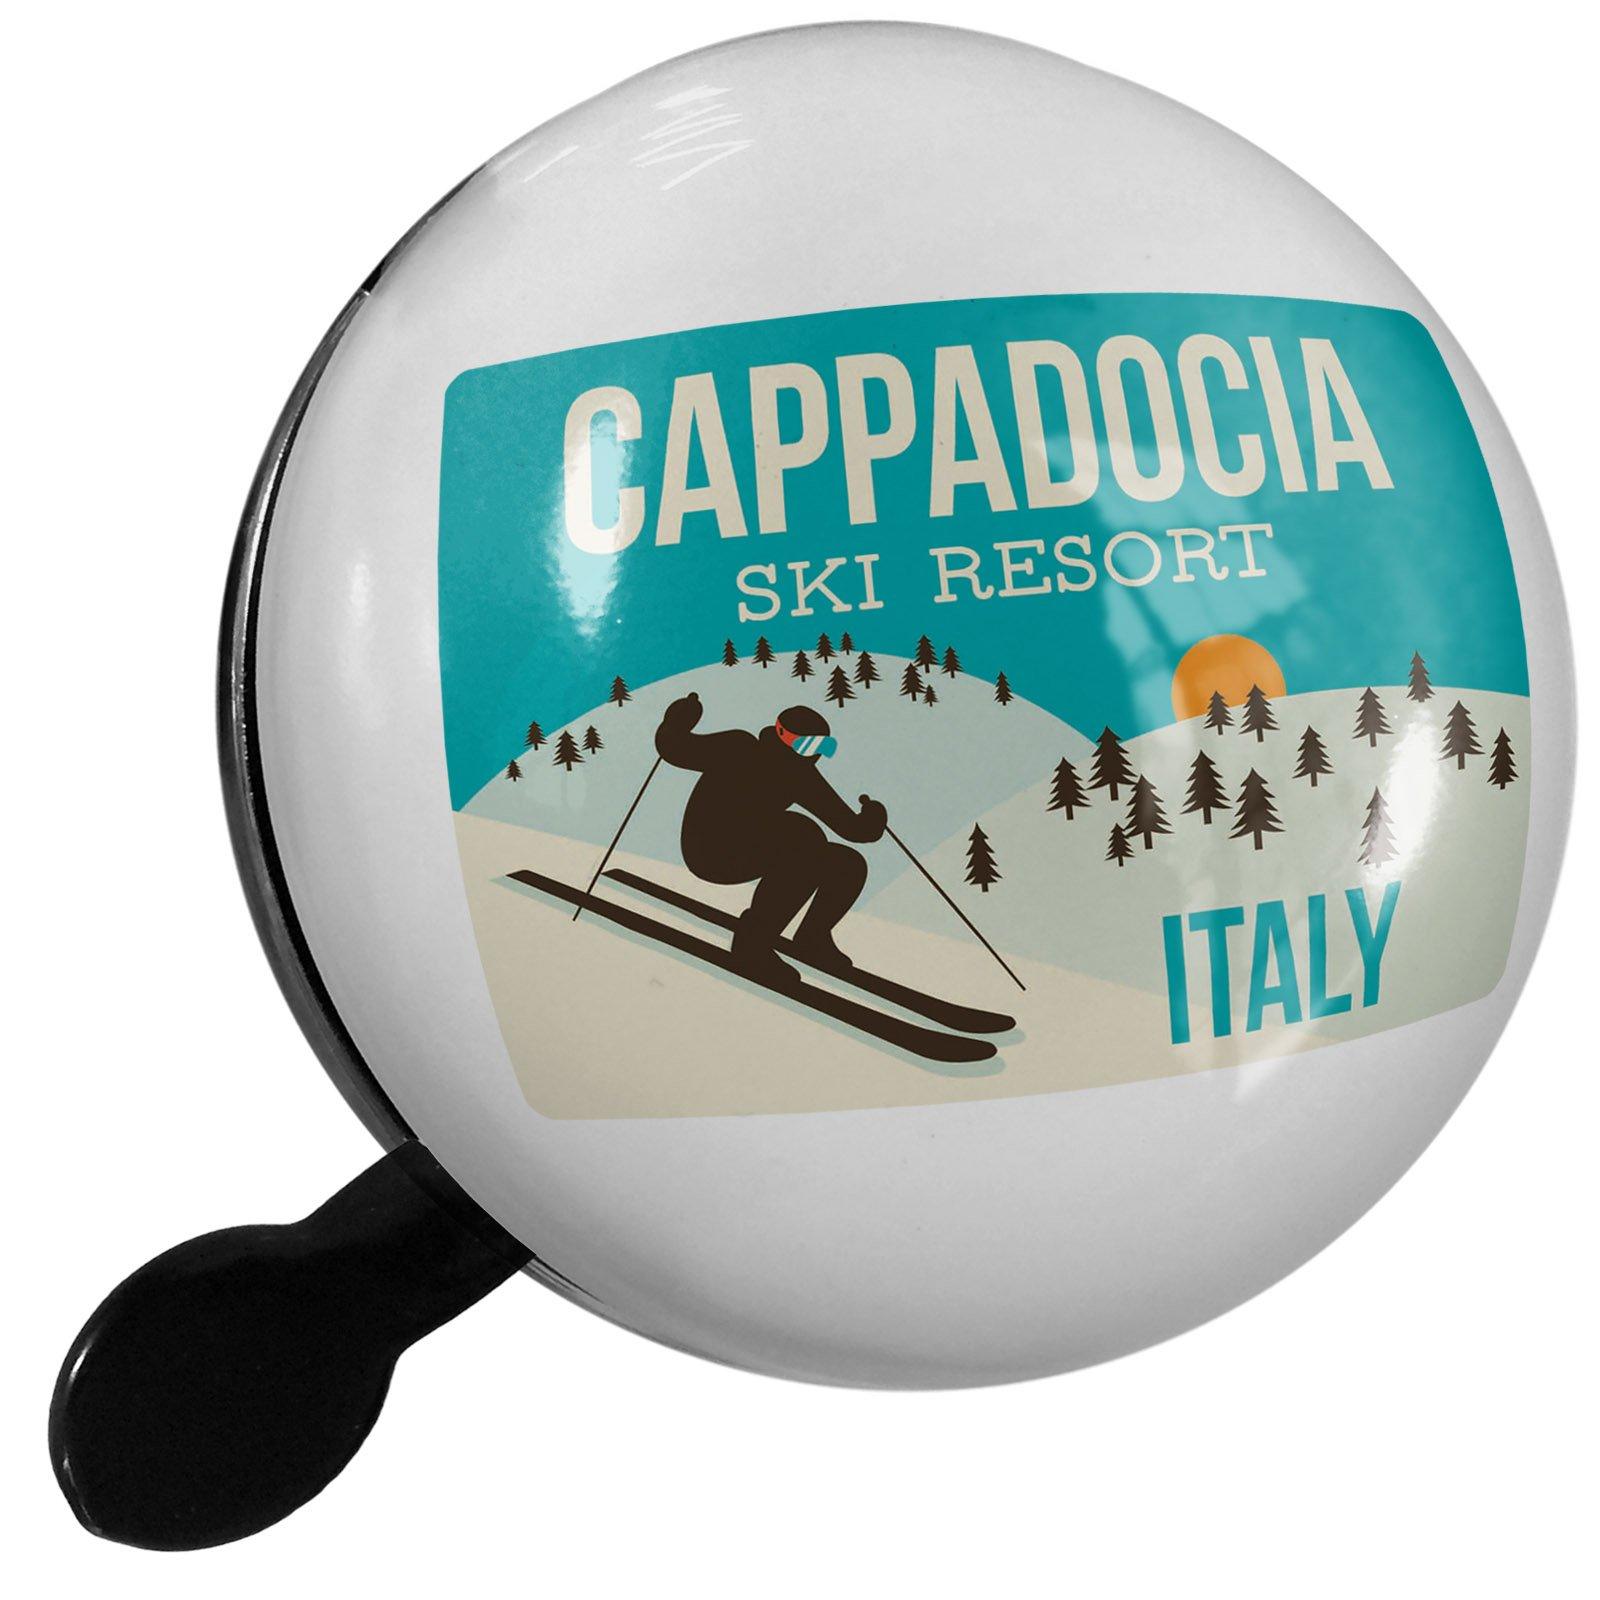 Small Bike Bell Cappadocia Ski Resort - Italy Ski Resort - NEONBLOND